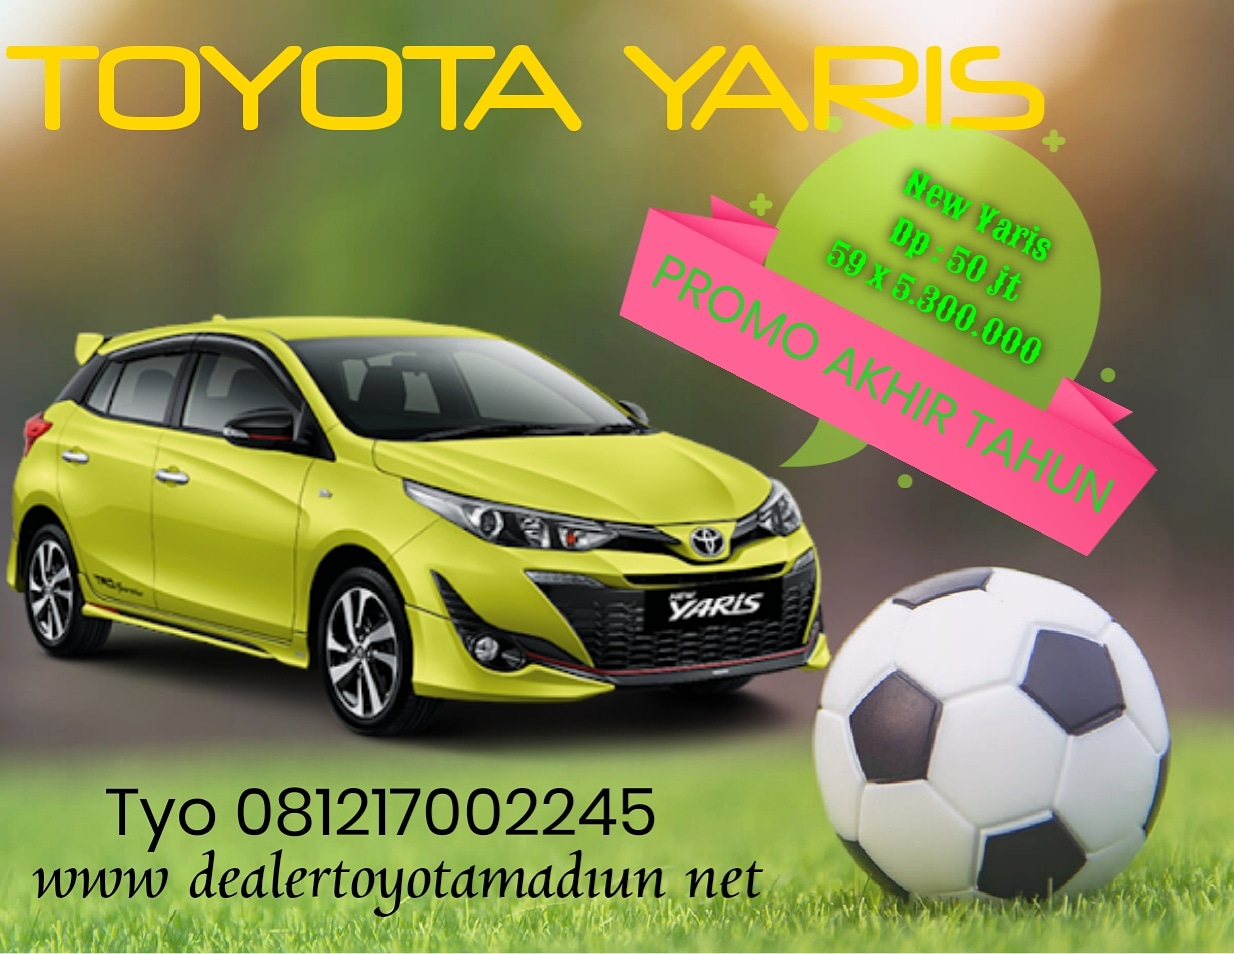 Info Toyota Yaris Hub : Tyo 081217002245